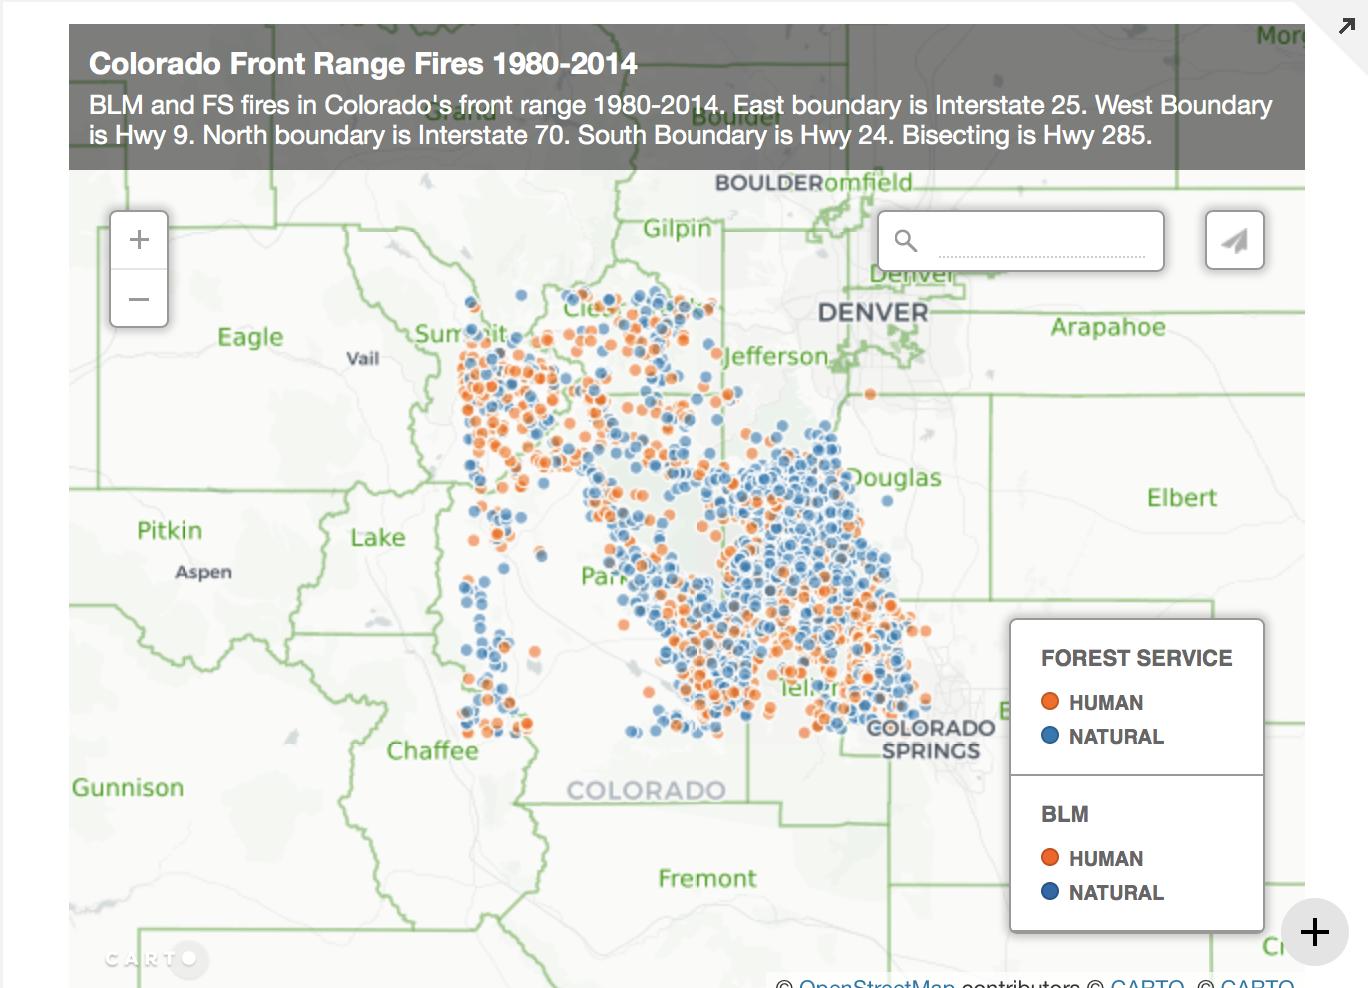 Hwy 285 Colorado Map.Hwy 285 Corridor Fire Data 1980 2014 18 Chains